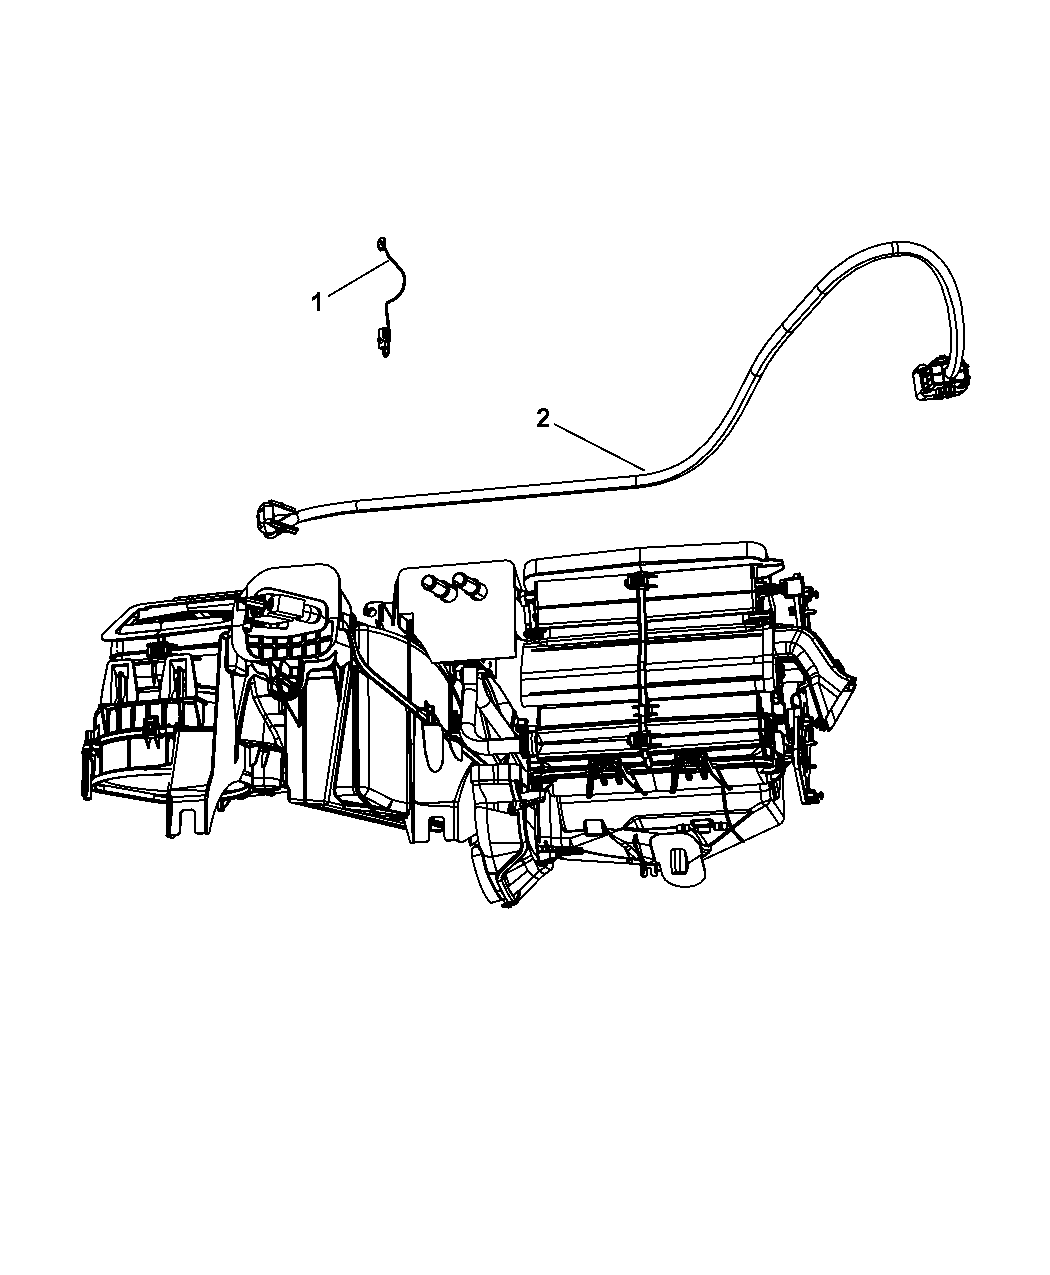 2009 Jeep Liberty Wiring - A/C & Heater - Mopar Parts Giant